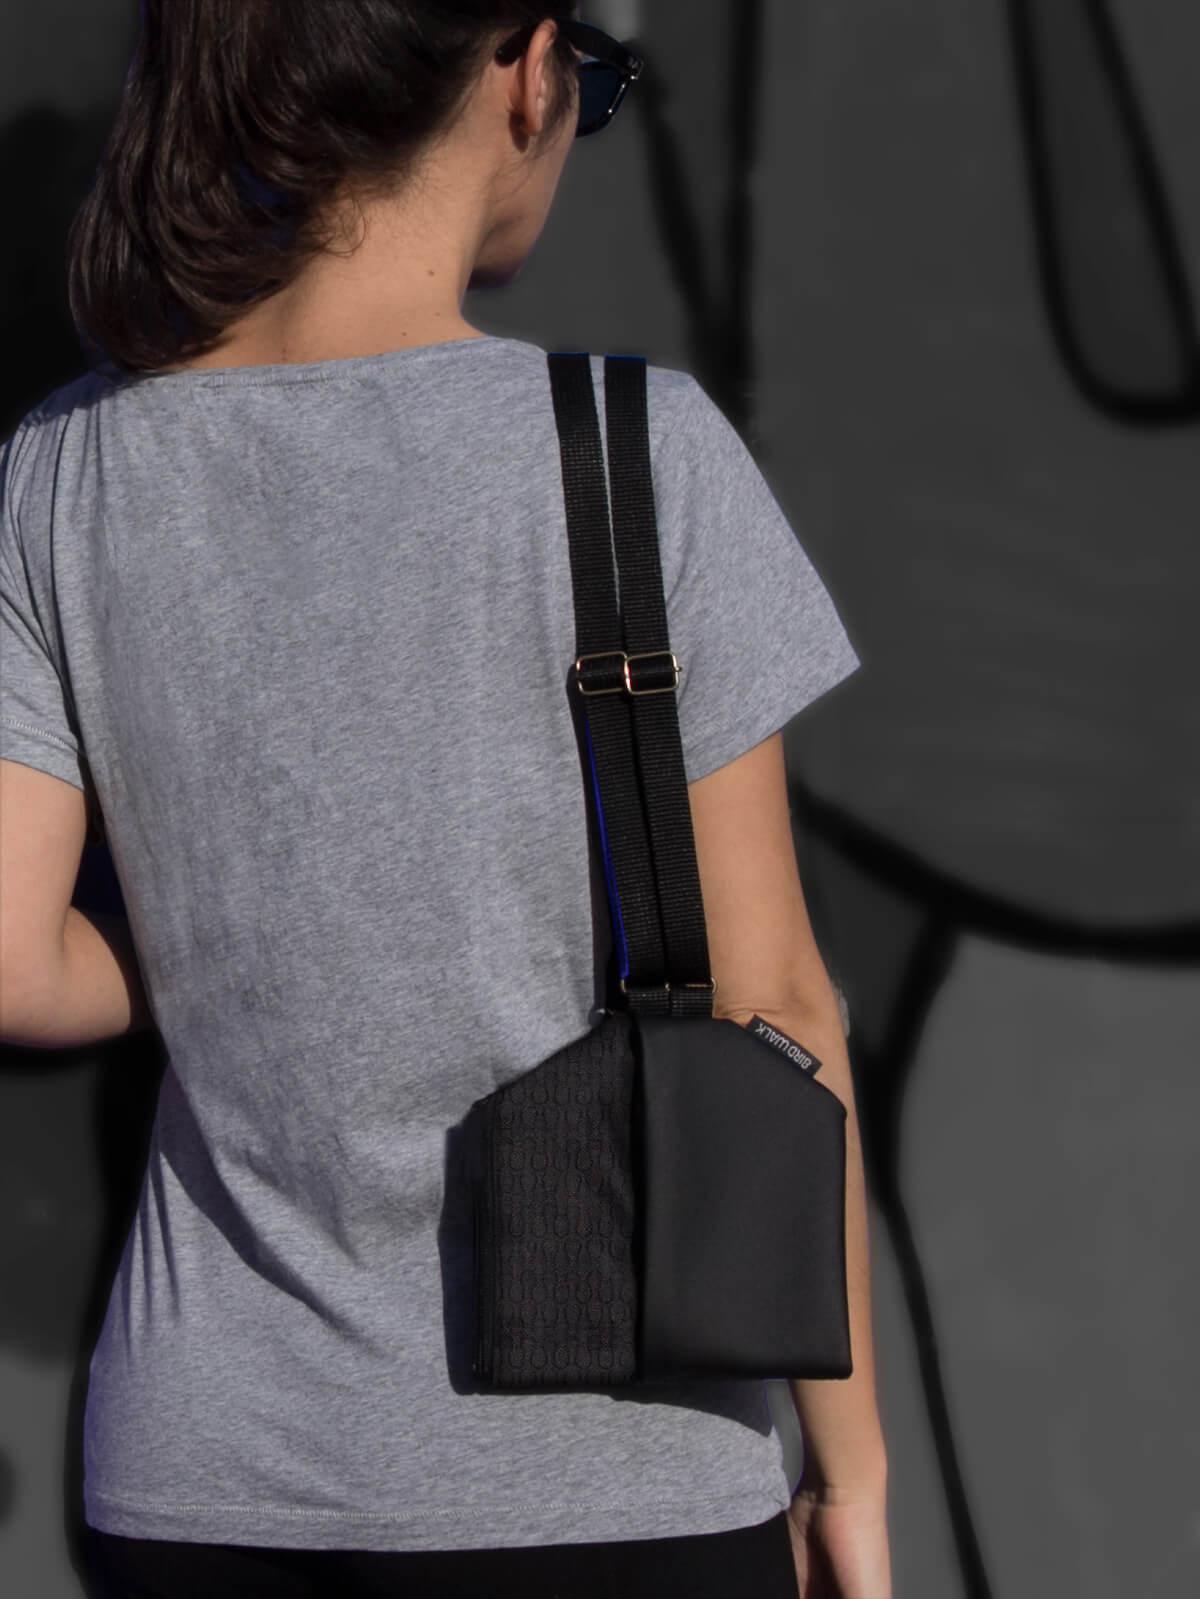 mala versátil design minimalista português